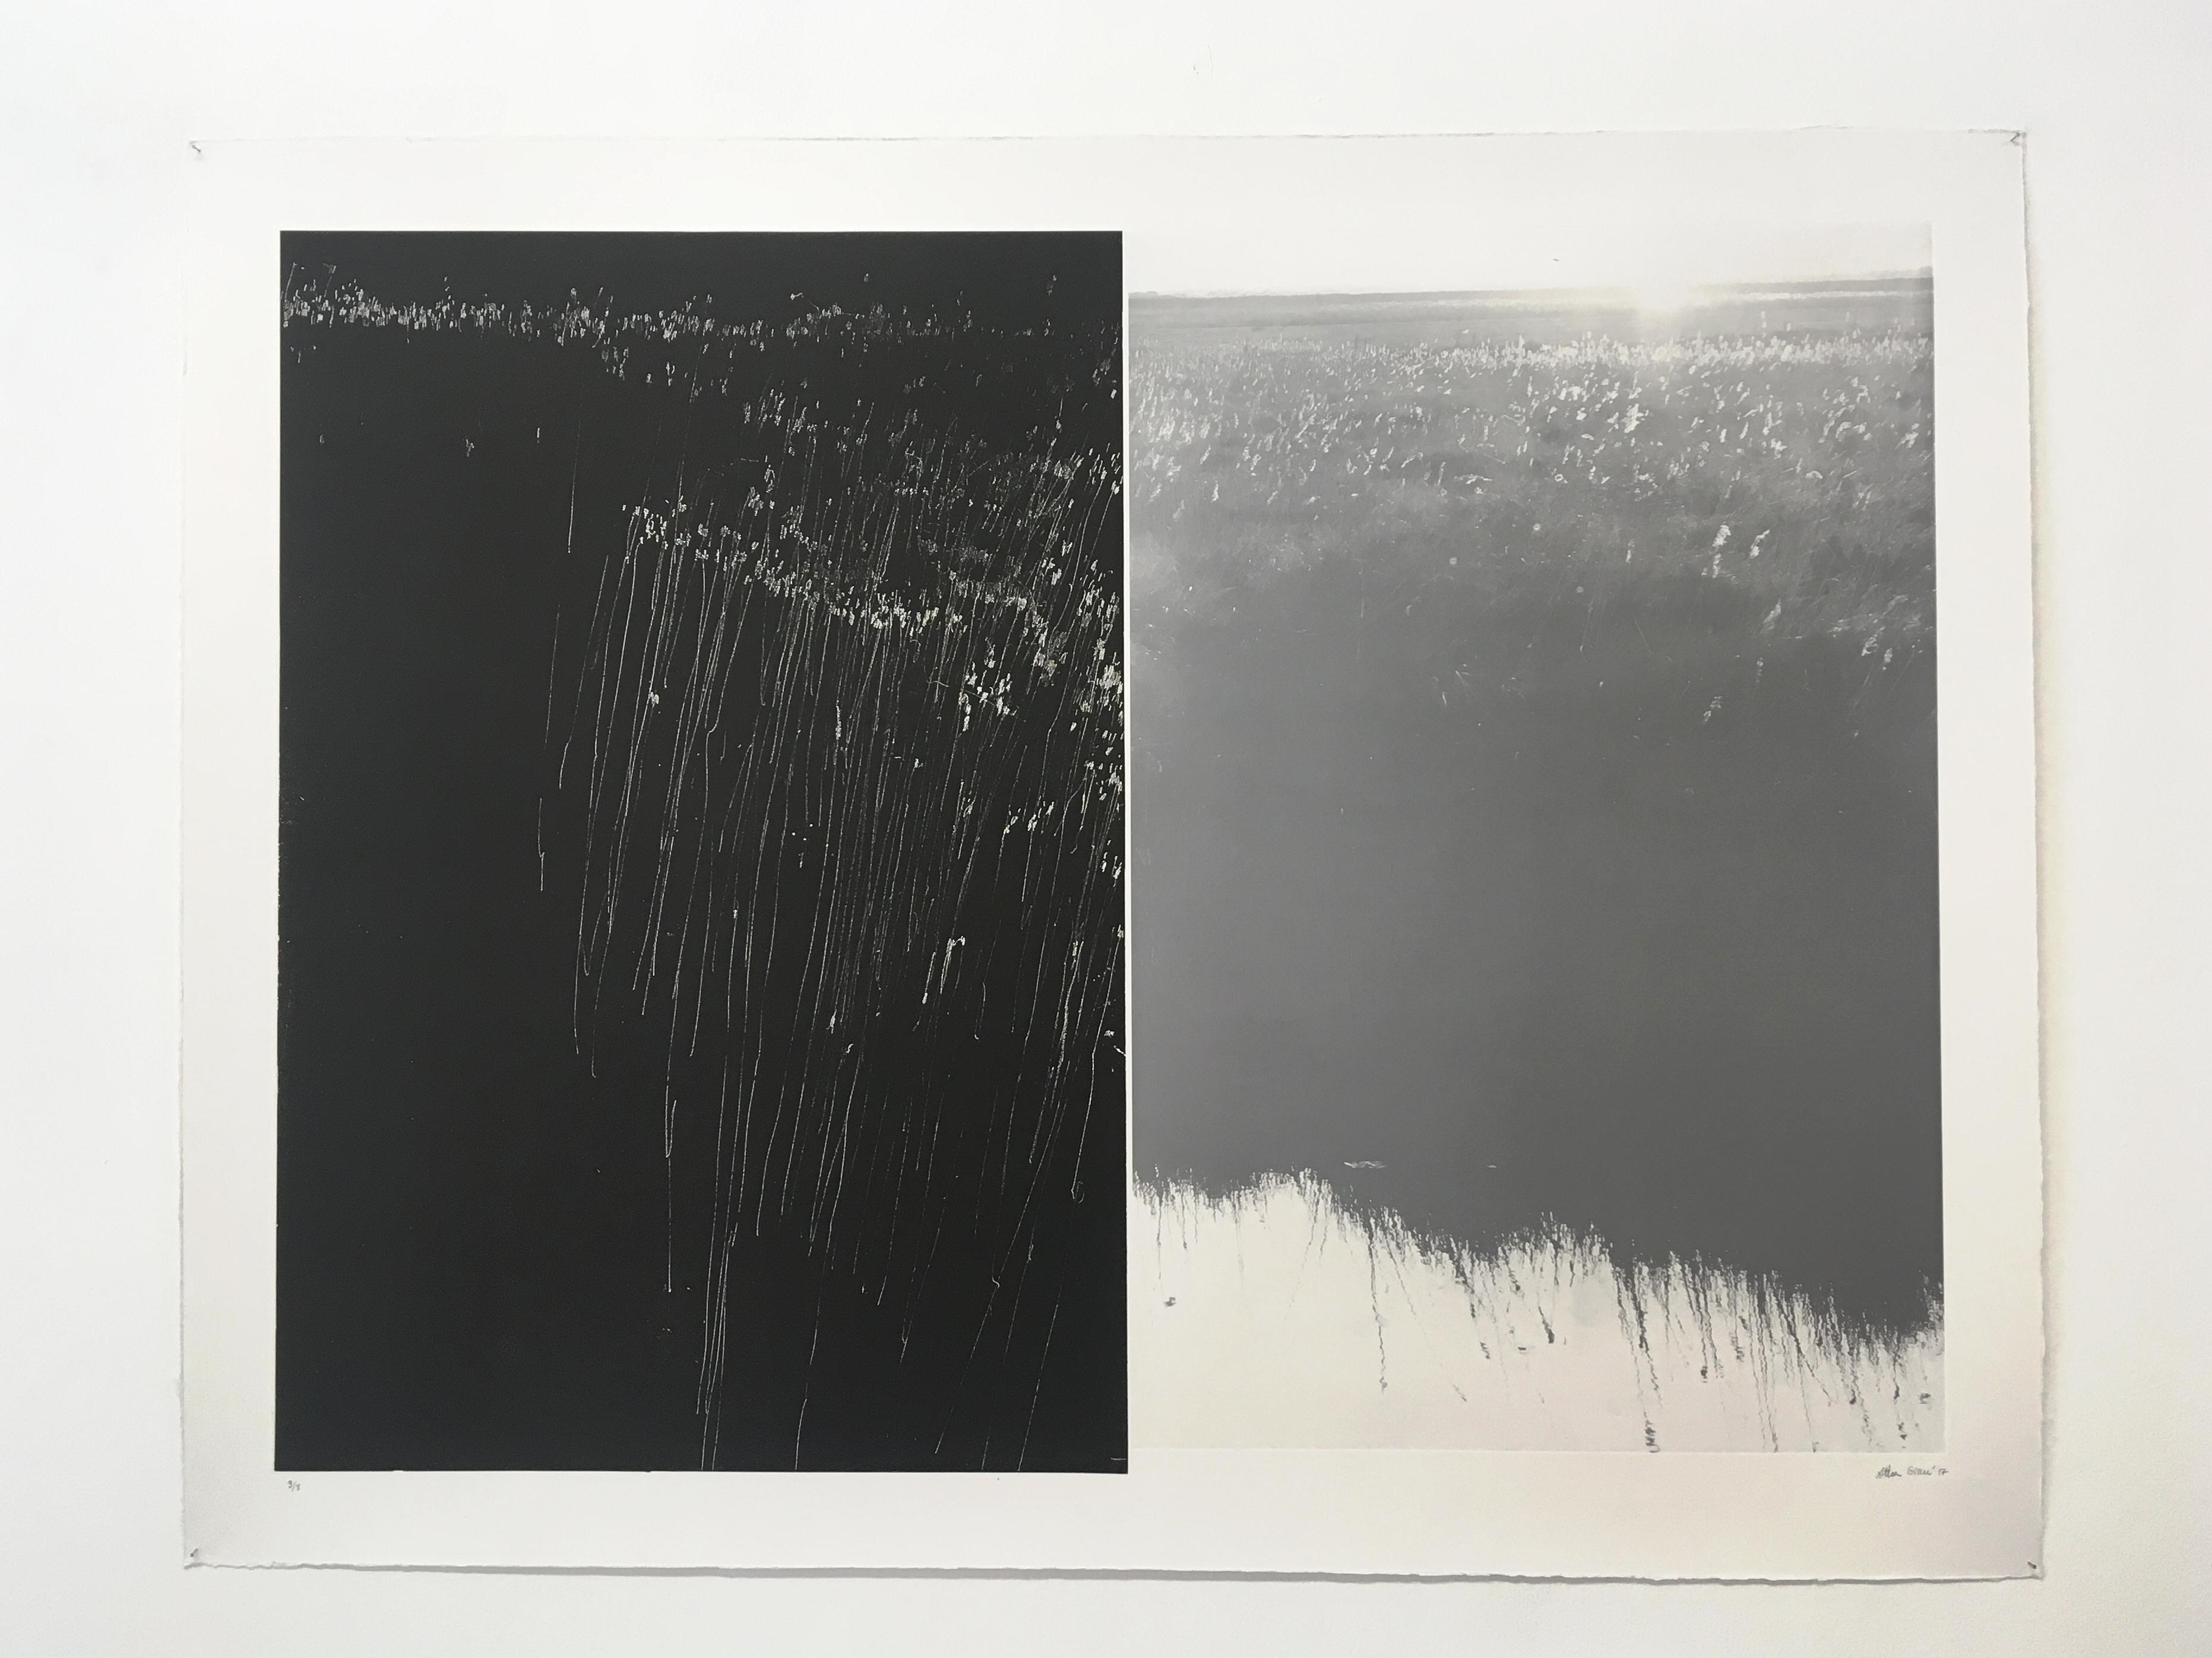 Entre plecs 3/8, 2017 (Aguafuerte y fotopolímero, 80×104 cm)